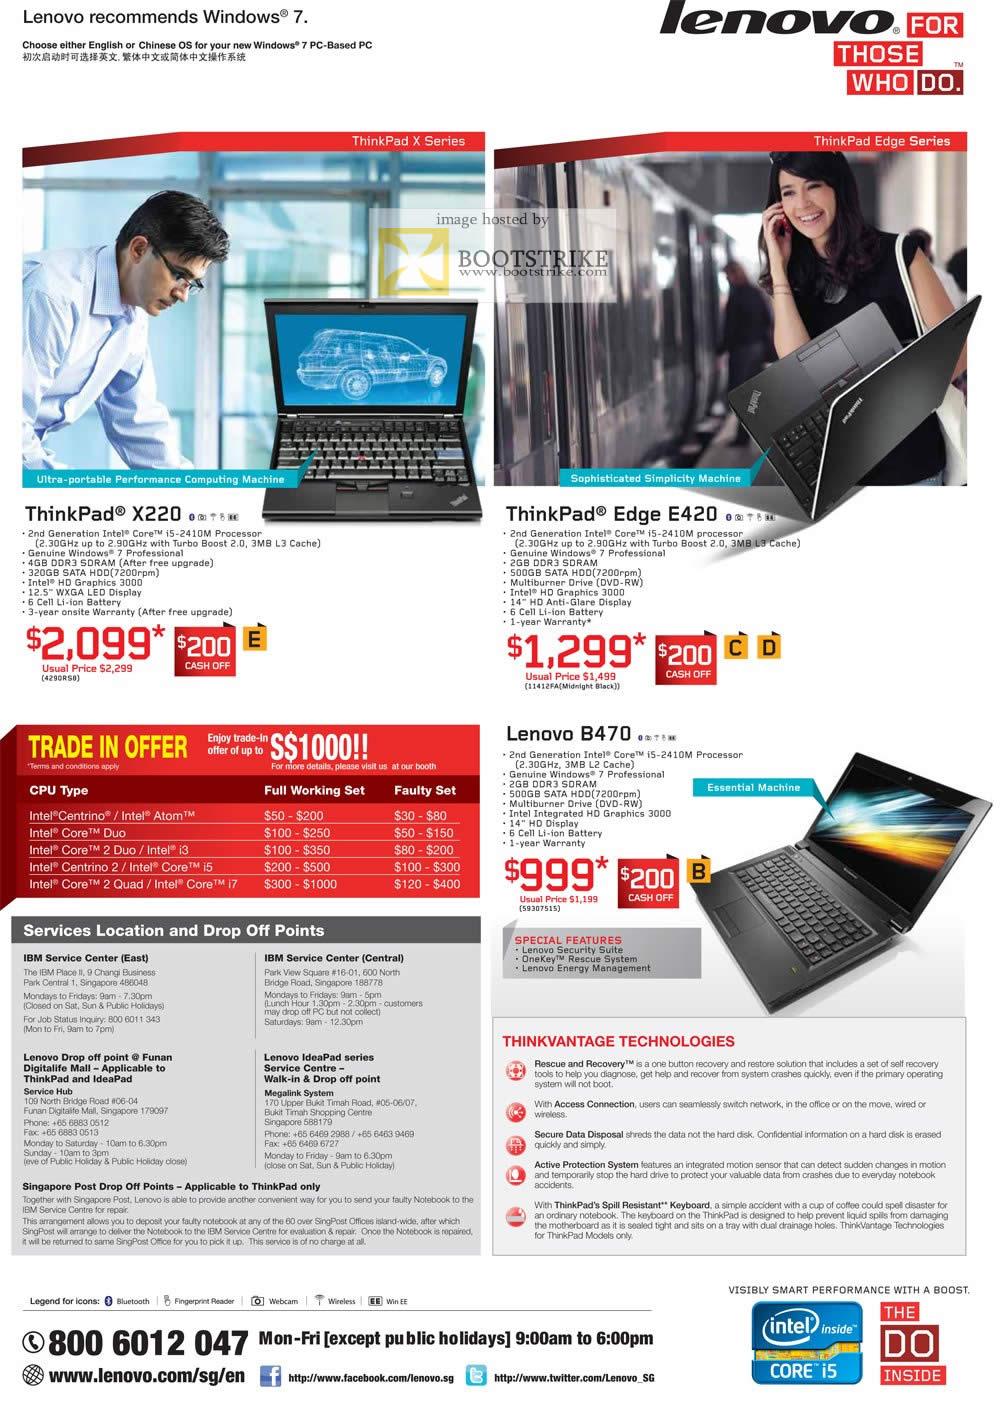 COMEX 2011 price list image brochure of Lenovo Notebooks ThinkPad X220 Edge E420 B470 Trade In